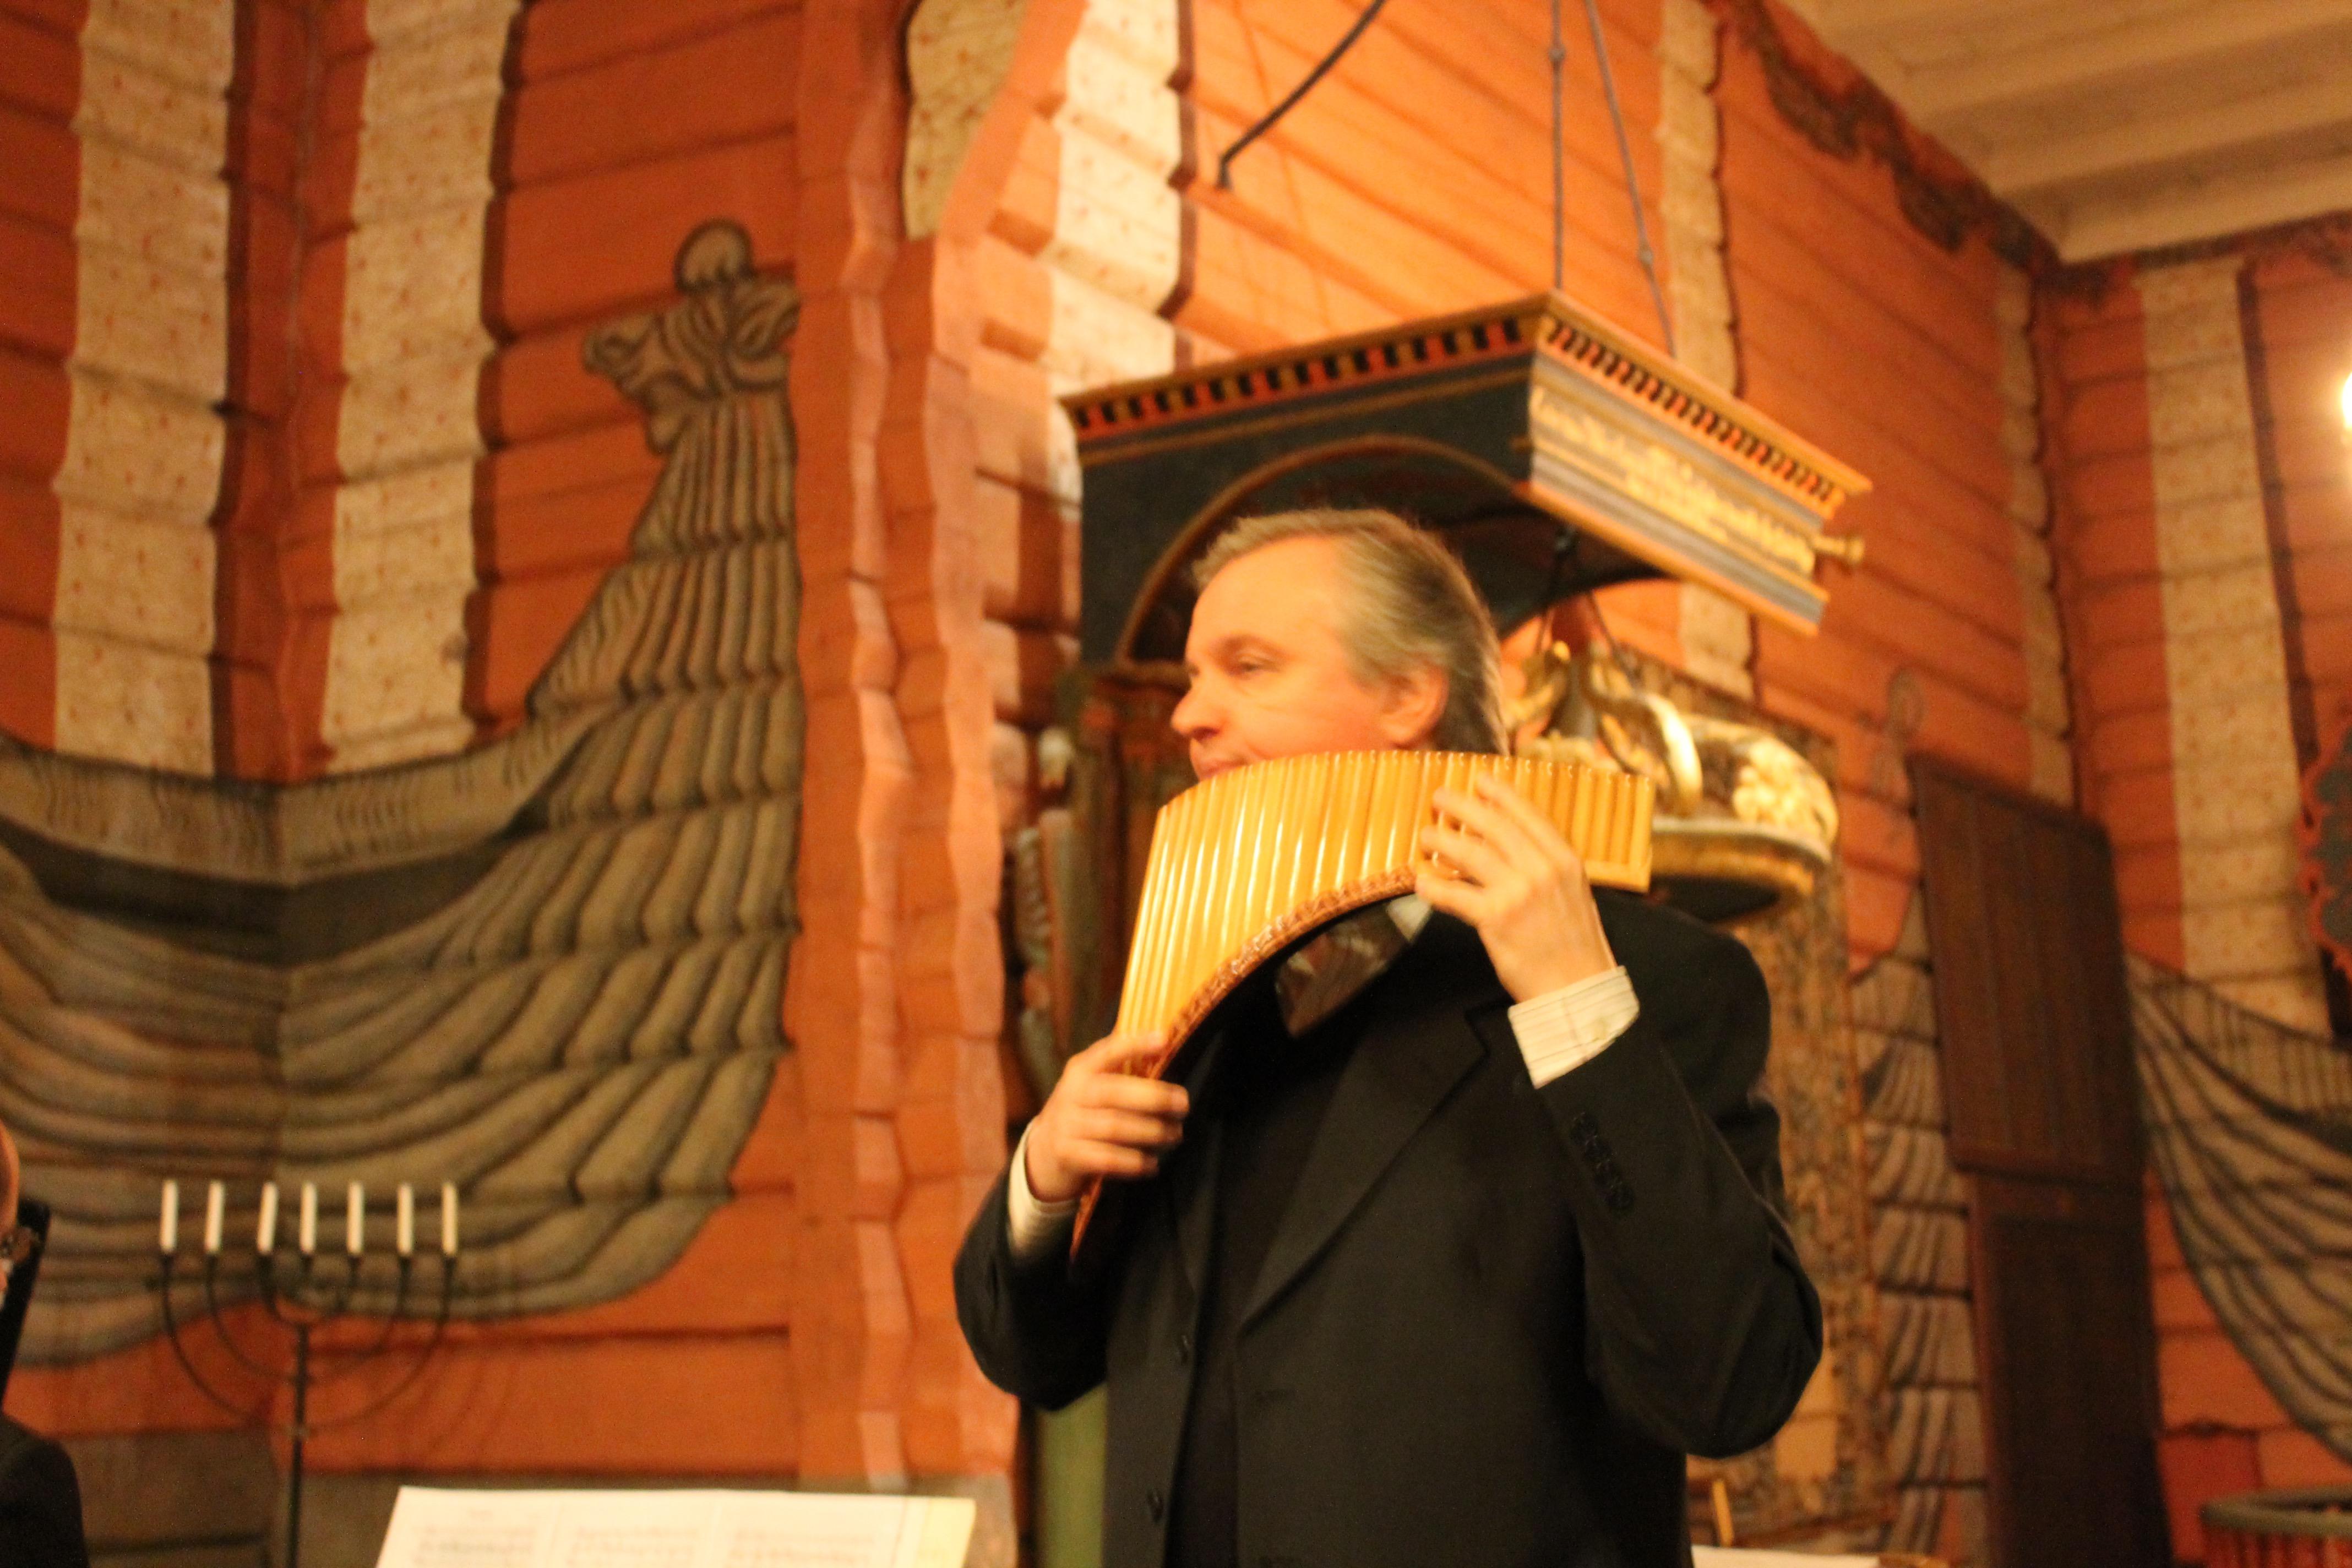 10 Konsert med Roar Engelberg Svarstad kirke 13.03.15 - 9015